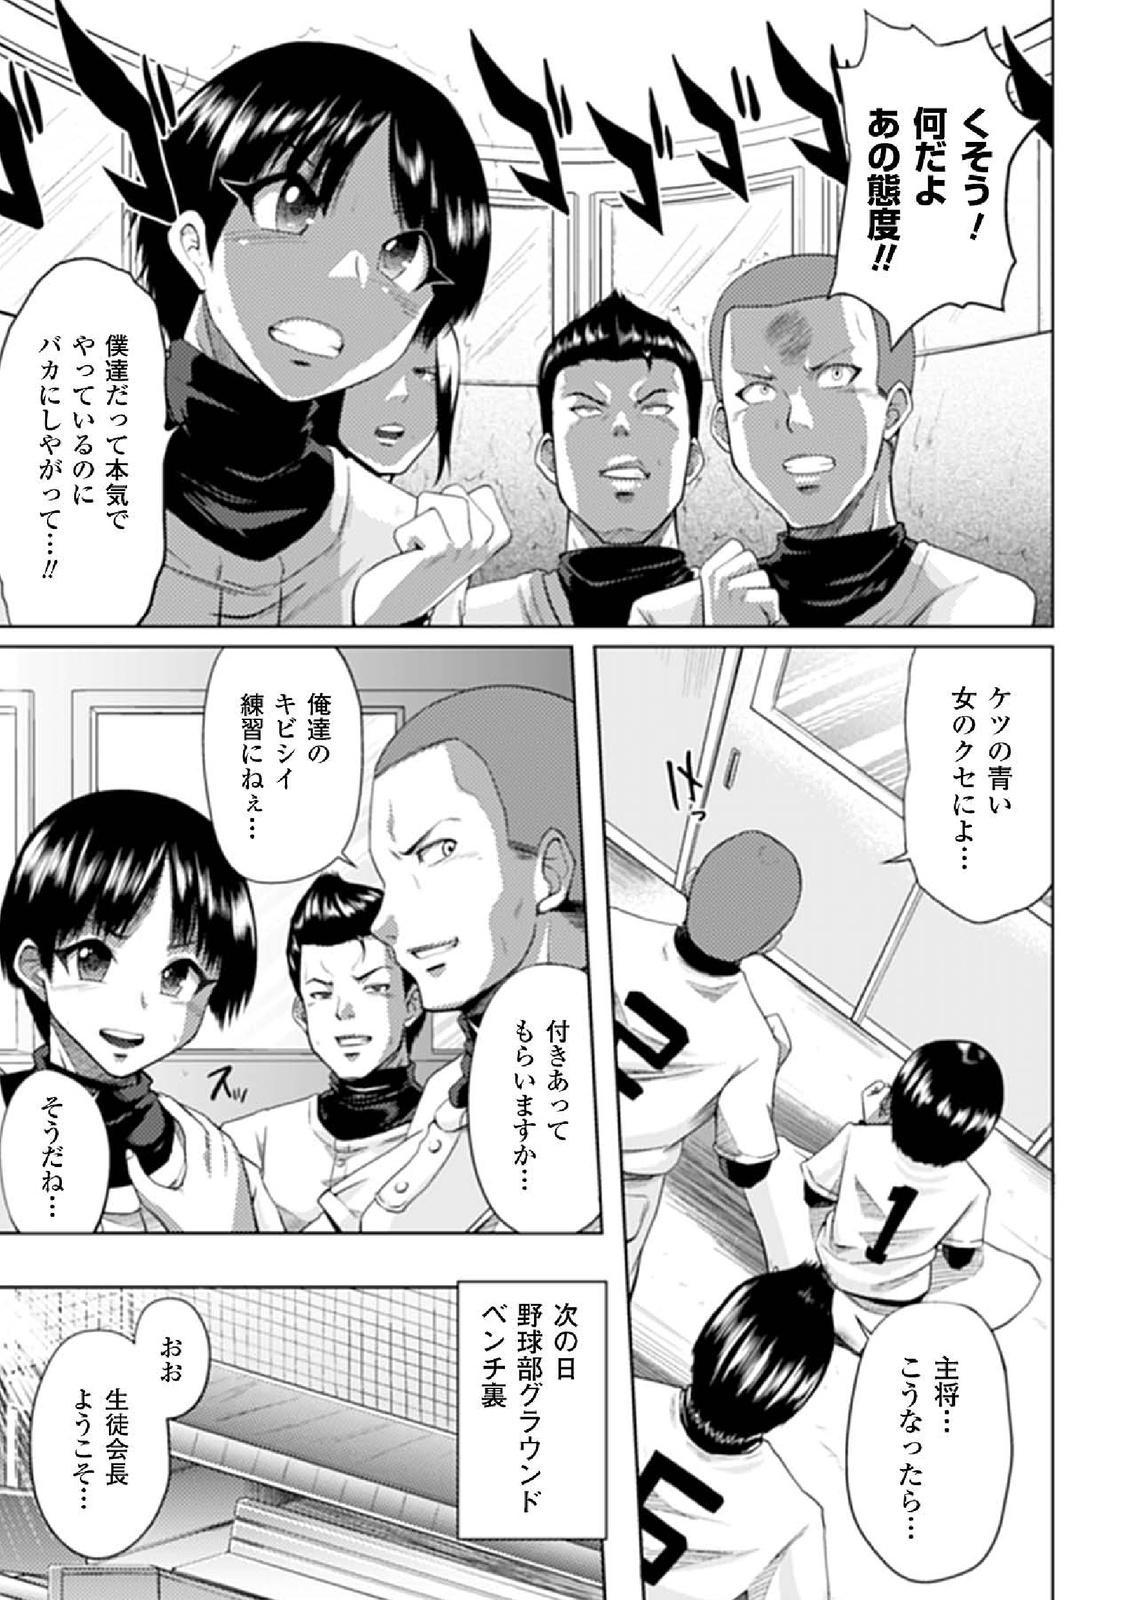 Mekakushi Anthology Comics Vol. 1 6